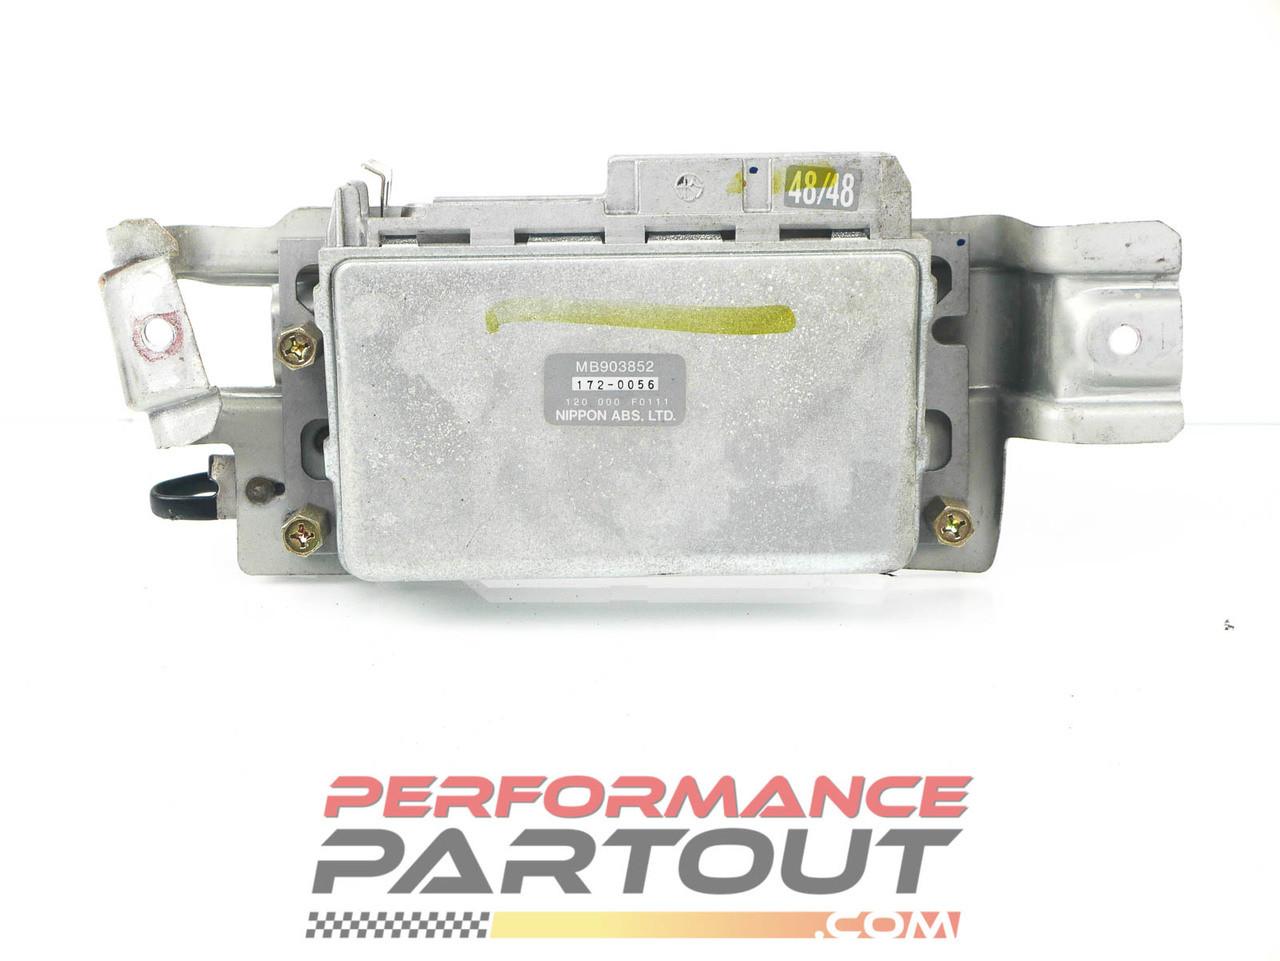 ABS control module 1G DSM